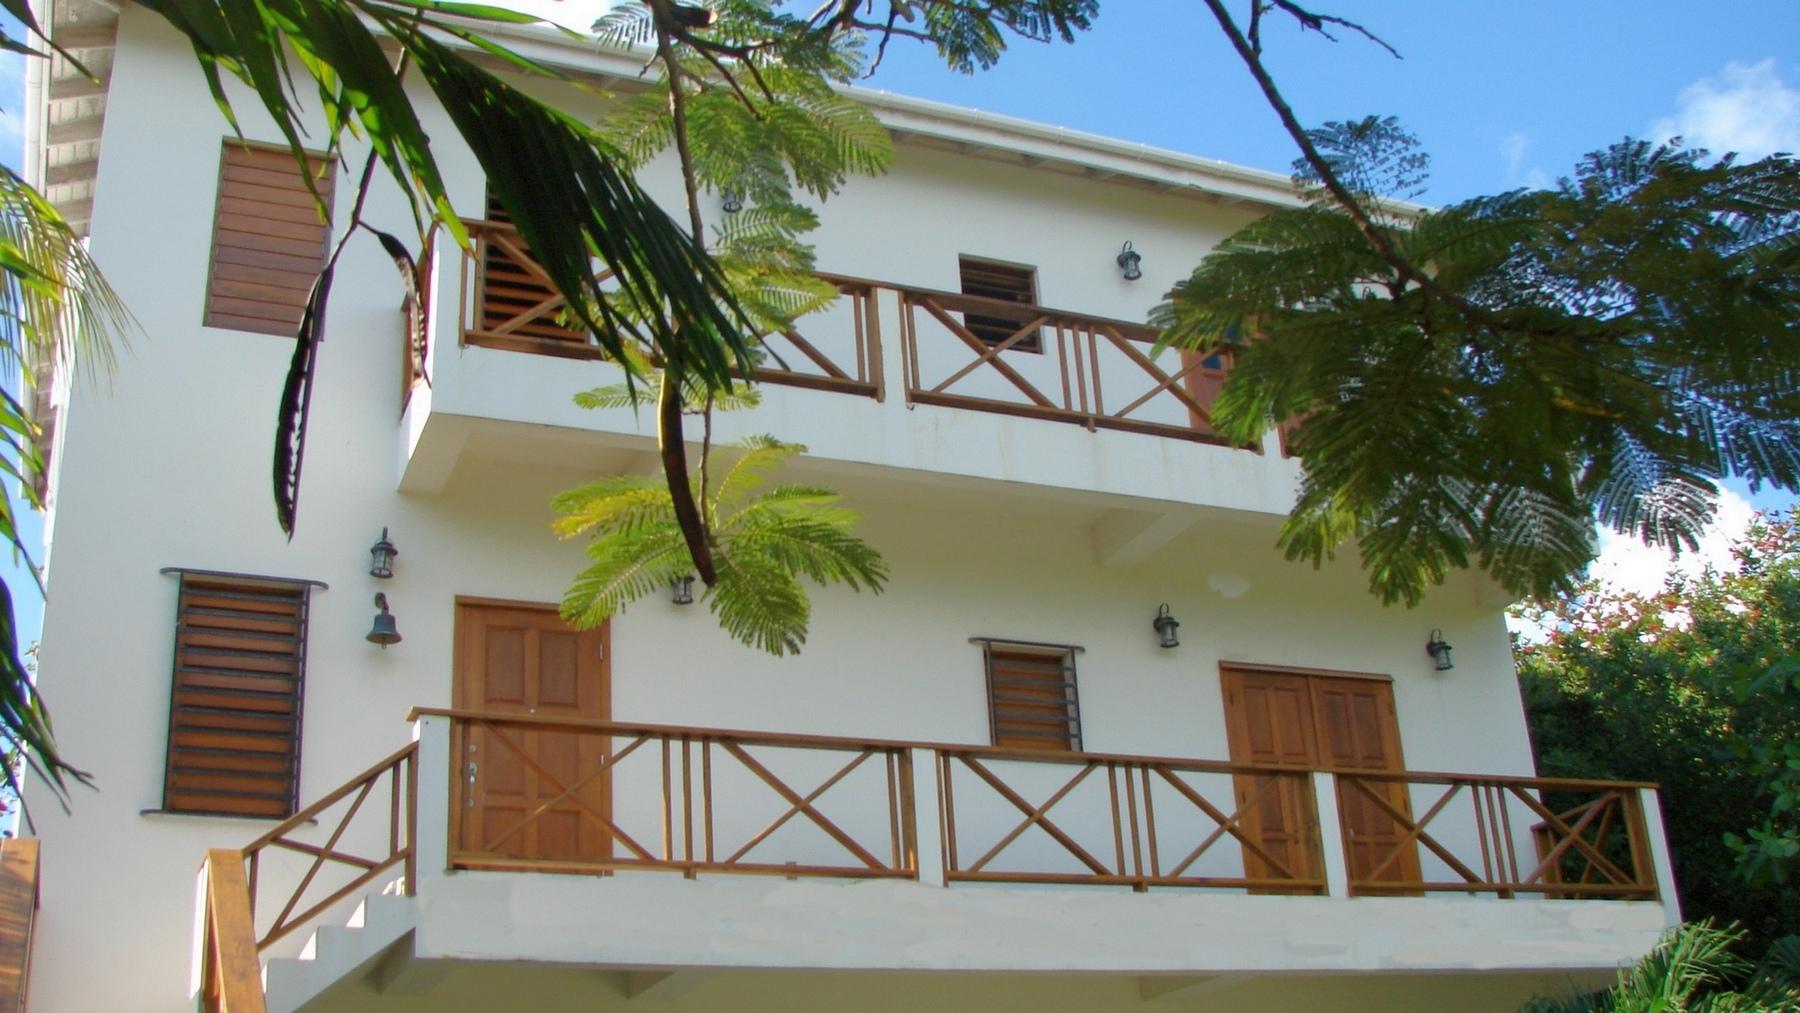 Moradia para Venda às Custom Home San Pedro Town, Ambergris Caye, Belize